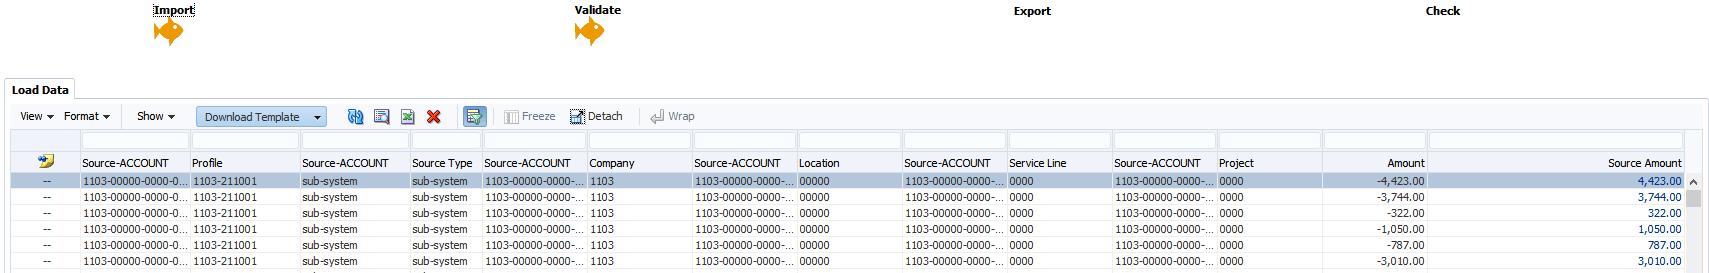 Data Load Workbench